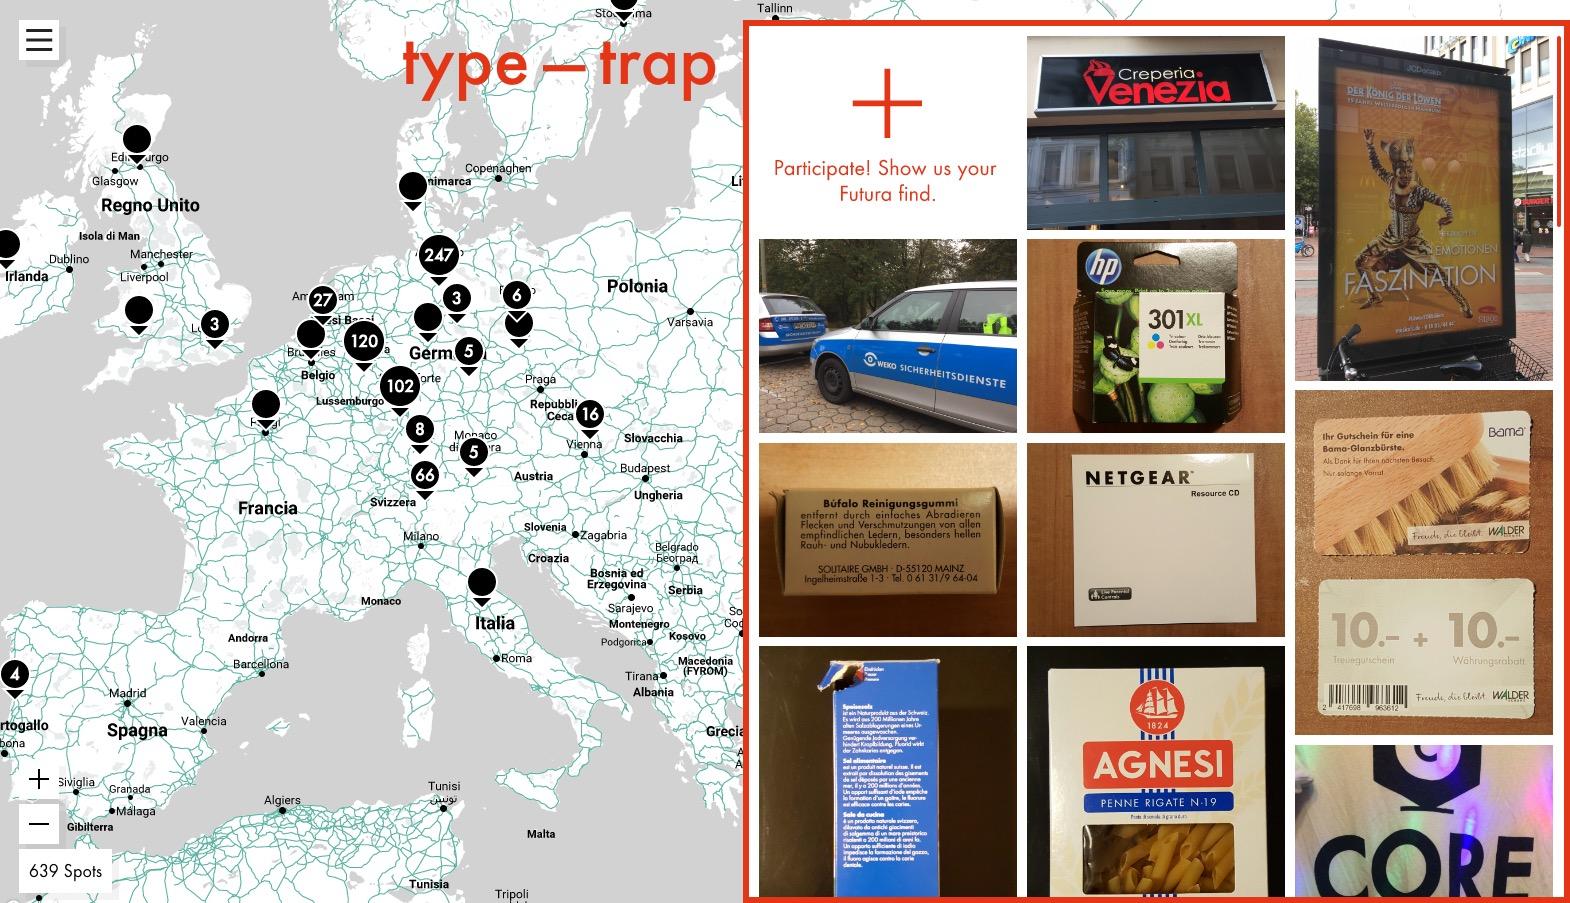 type-trap